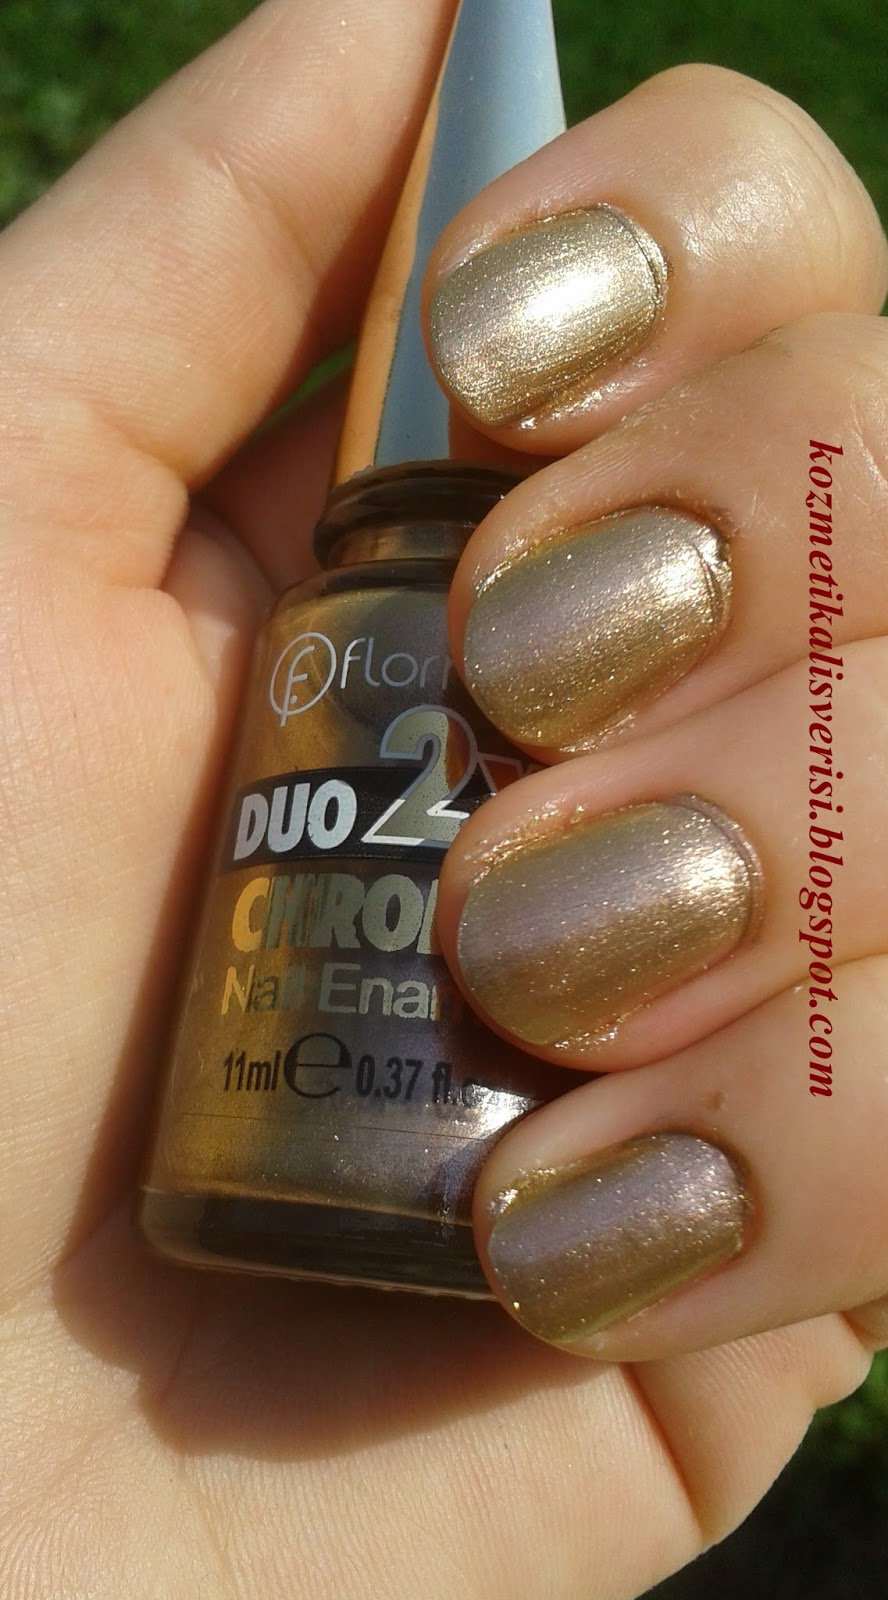 Duo 2X Chrome Nail Enamel DC 01